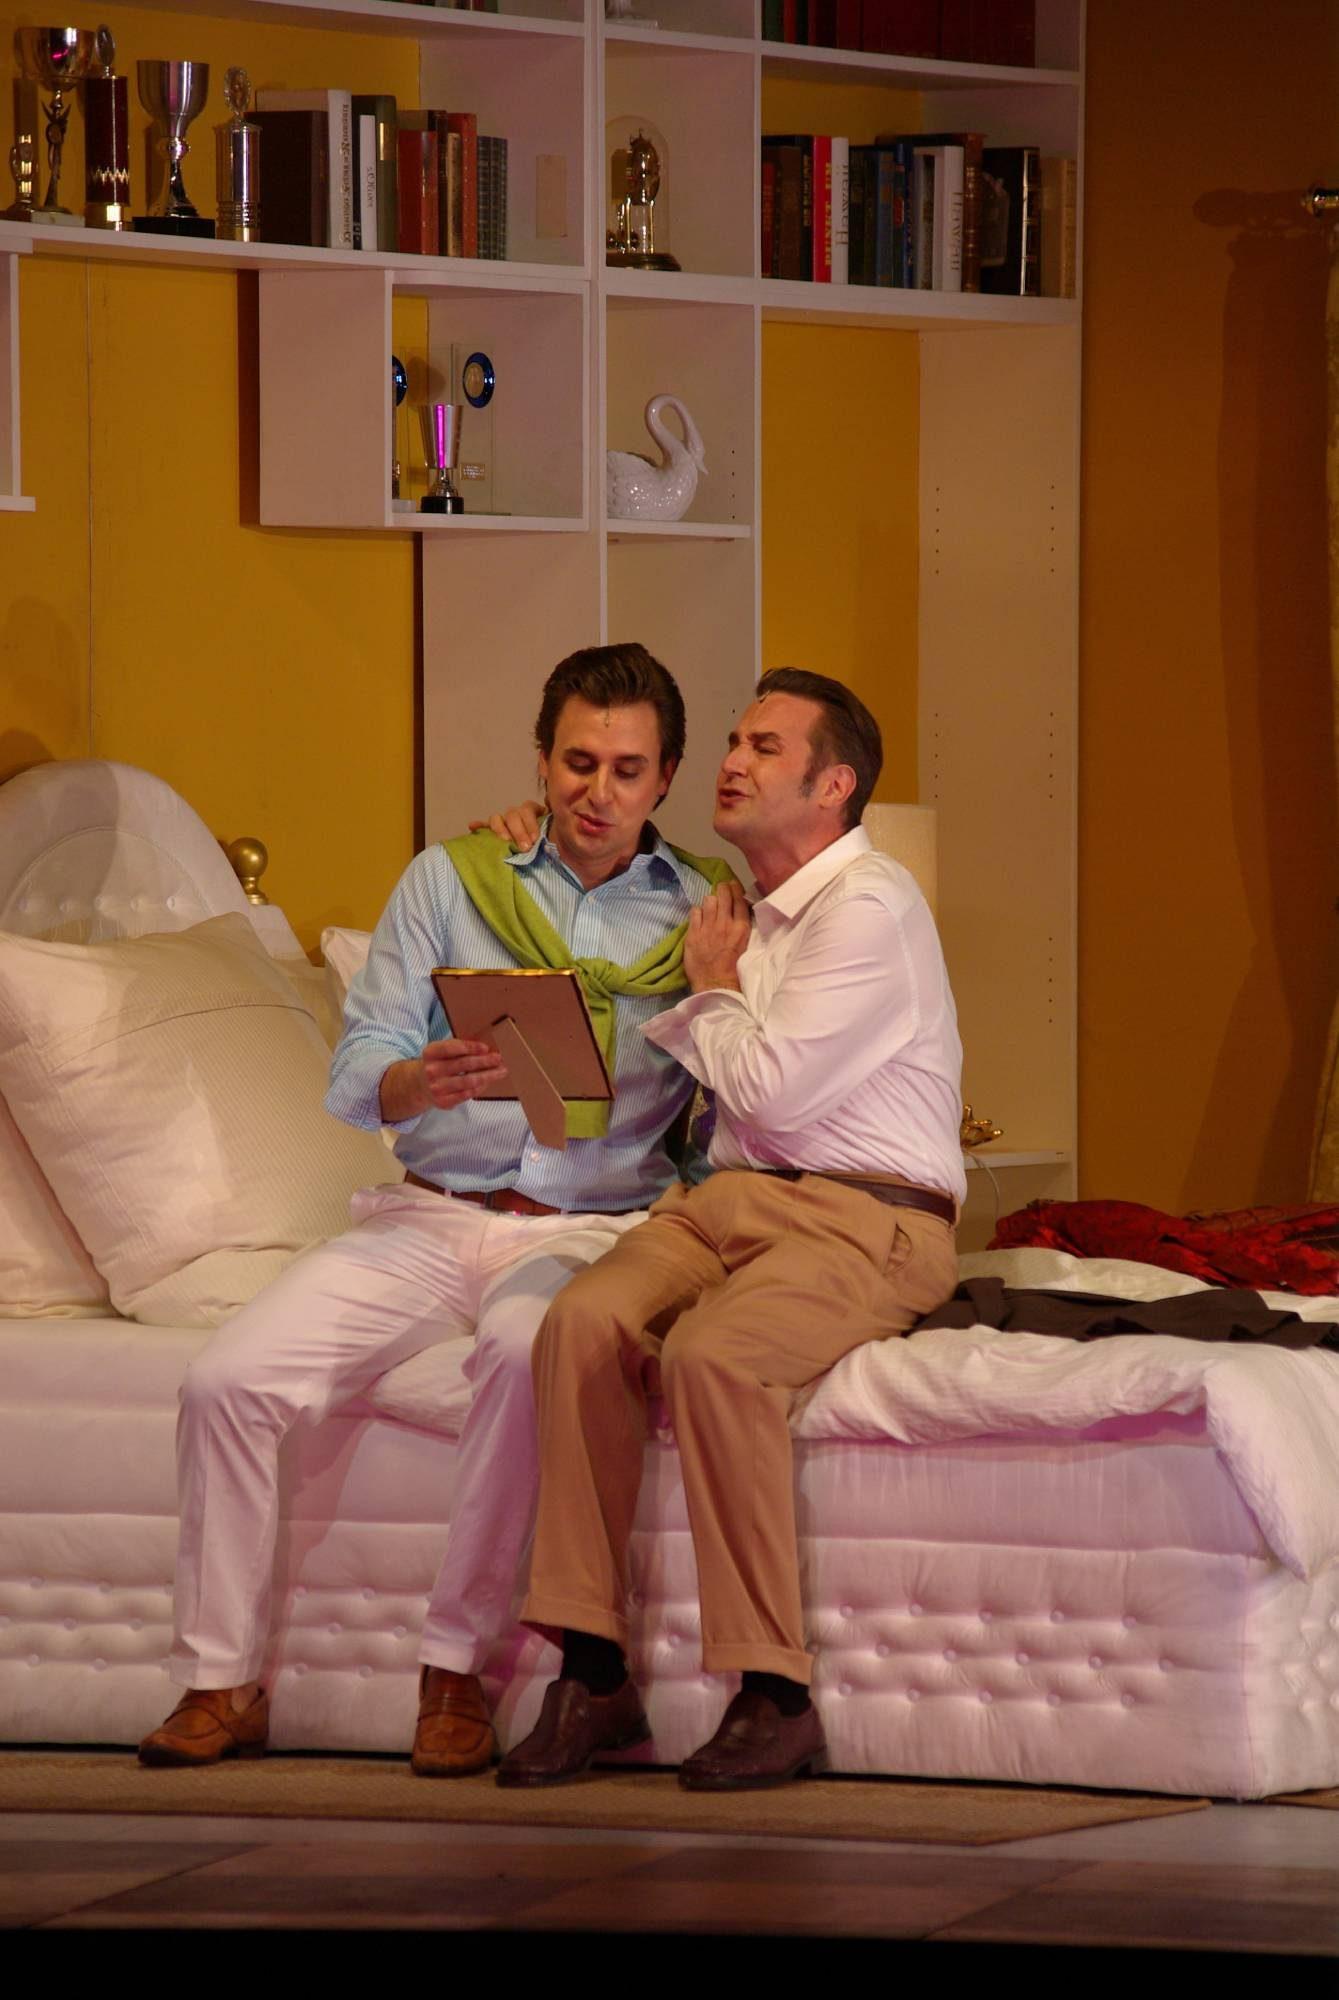 die Fledermaus,staatstheater darmstadt,regie:nicole claudia weber,foto:friedrich eggert